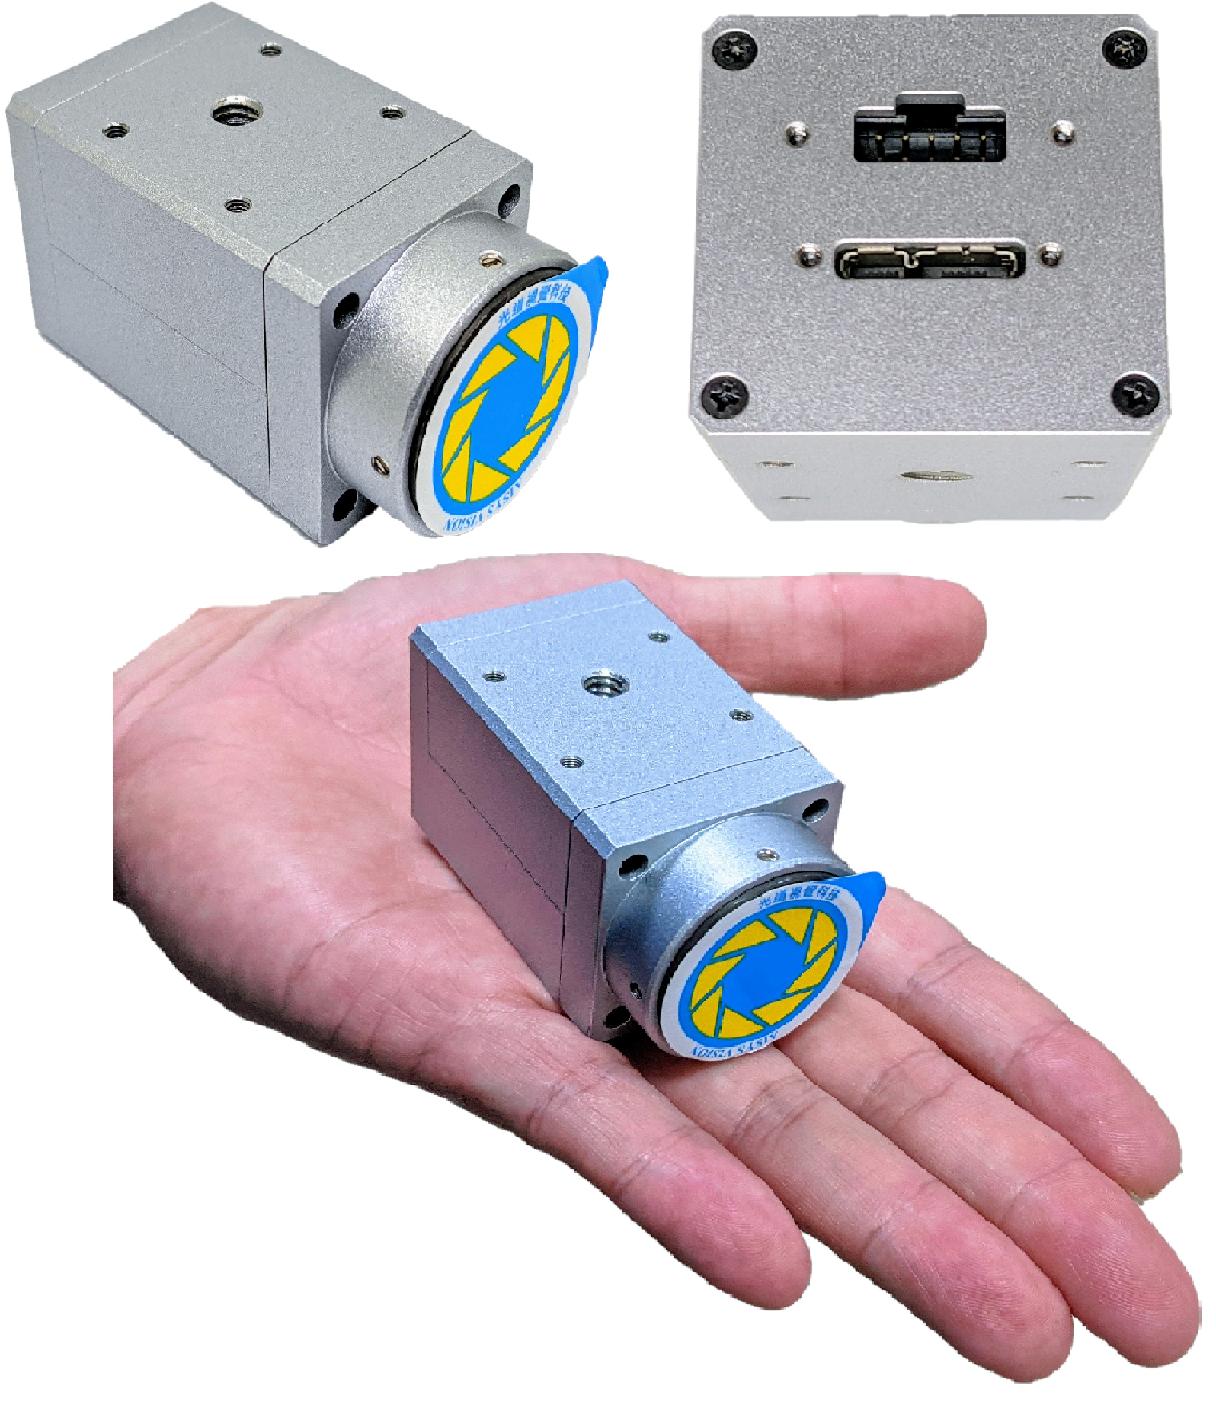 CYCLOPS SU300FC-108攝影機-3.0M像素、非同步式、彩色、內建LED燈源控制器